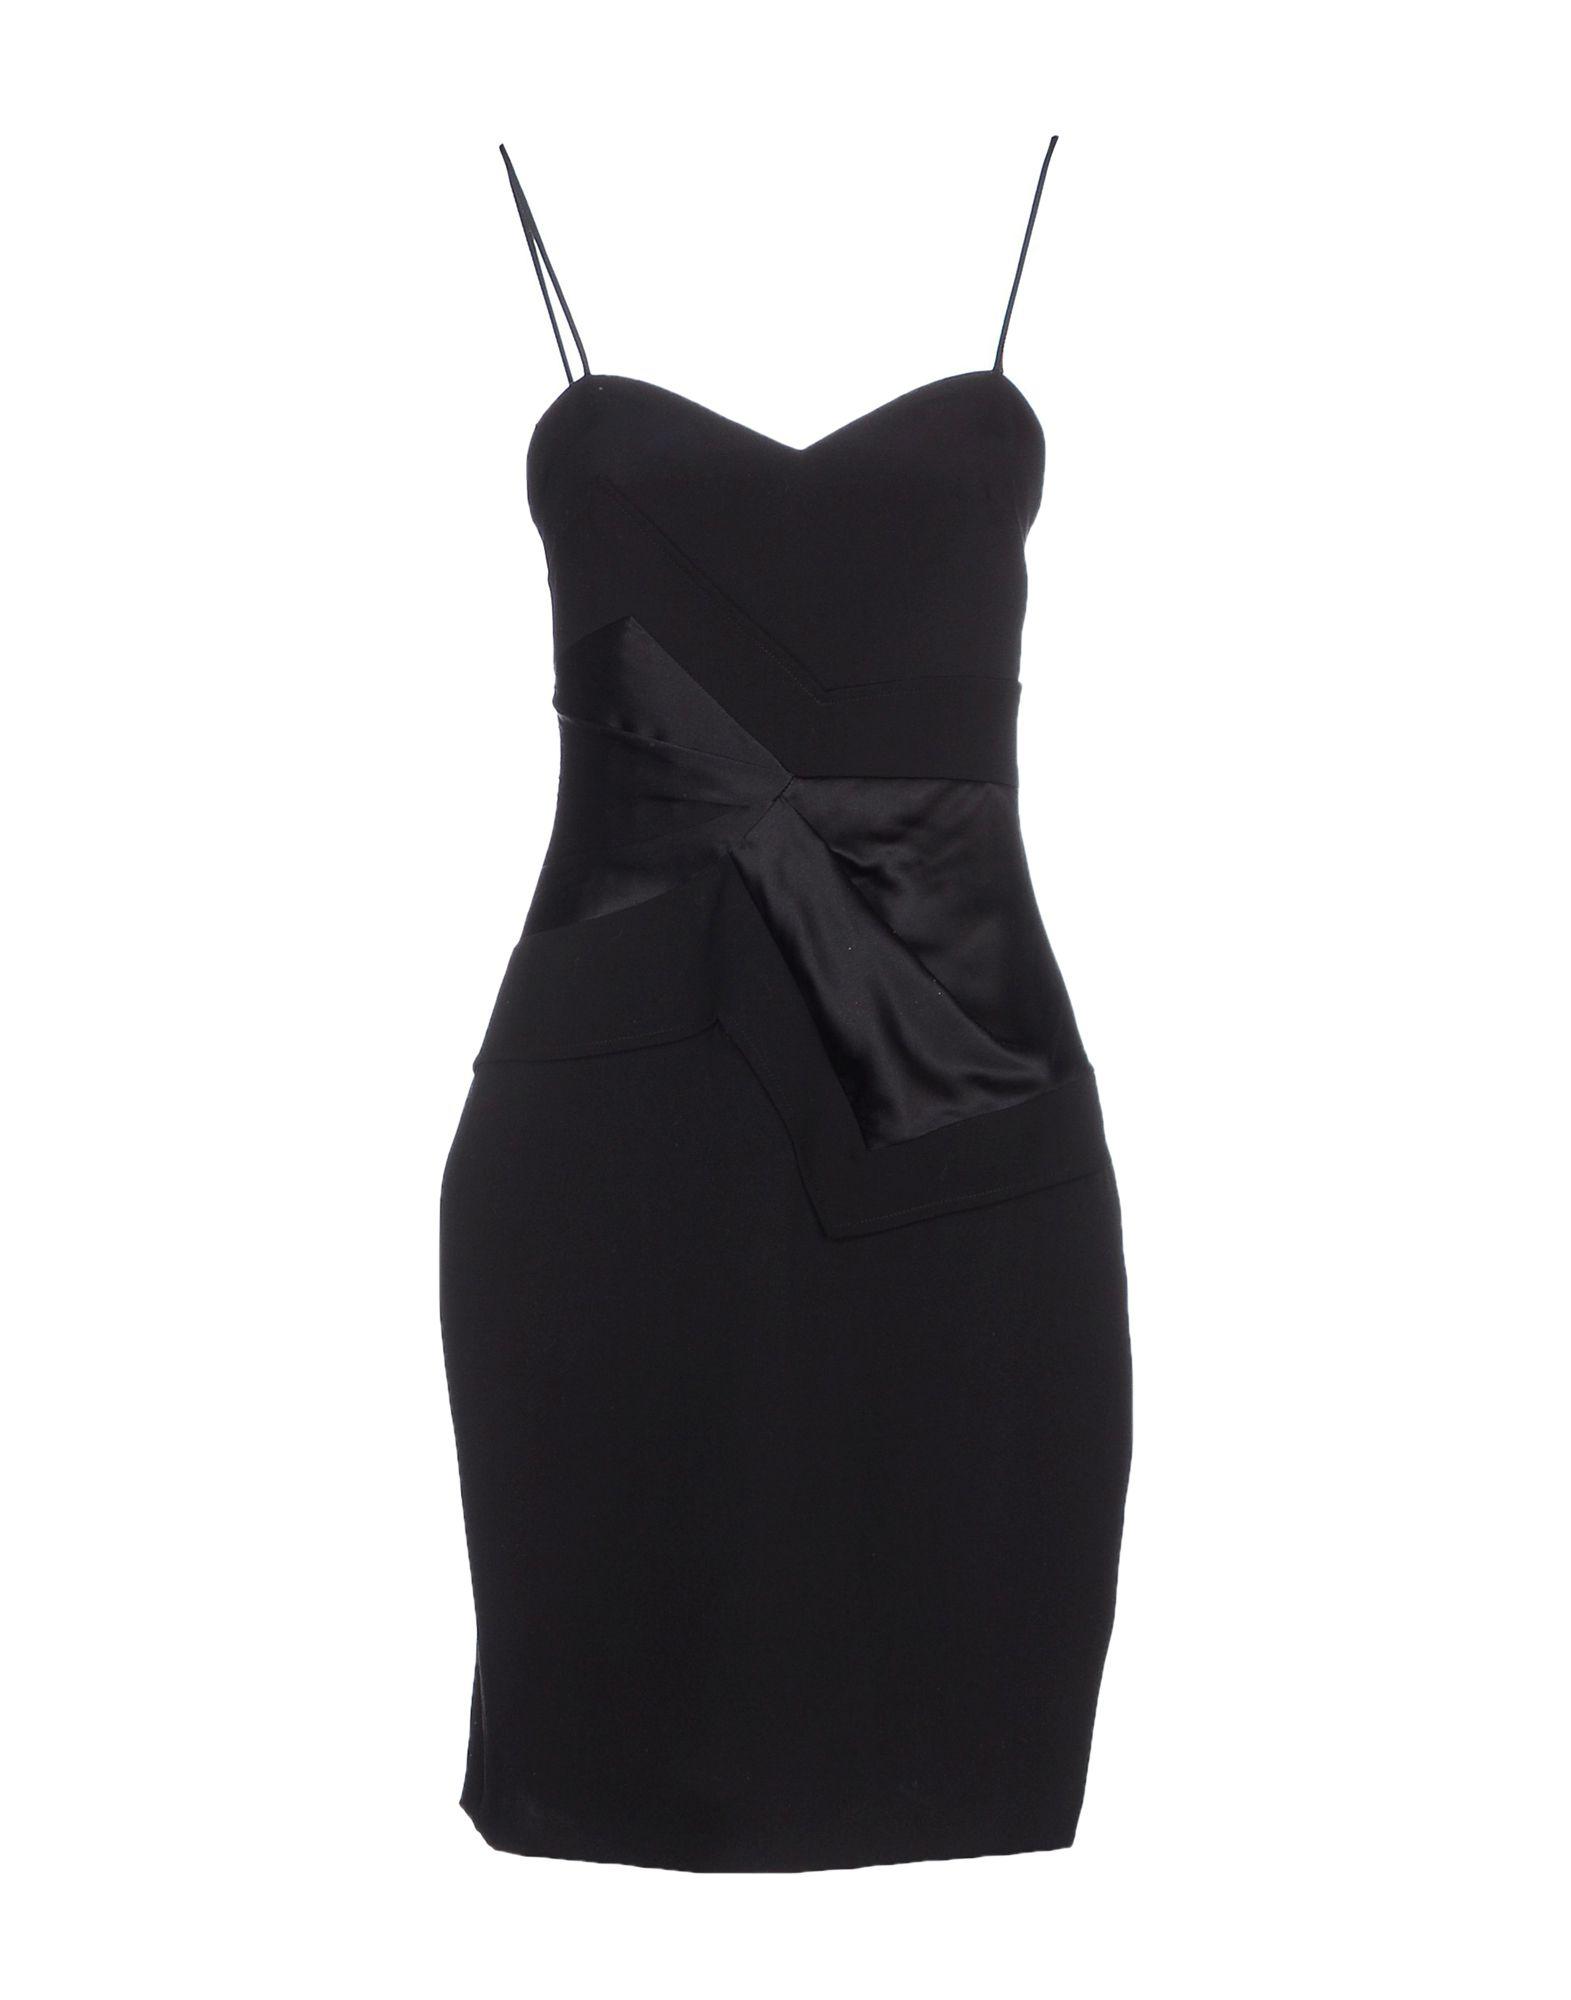 Prabal gurung Short Dress in Black | Lyst